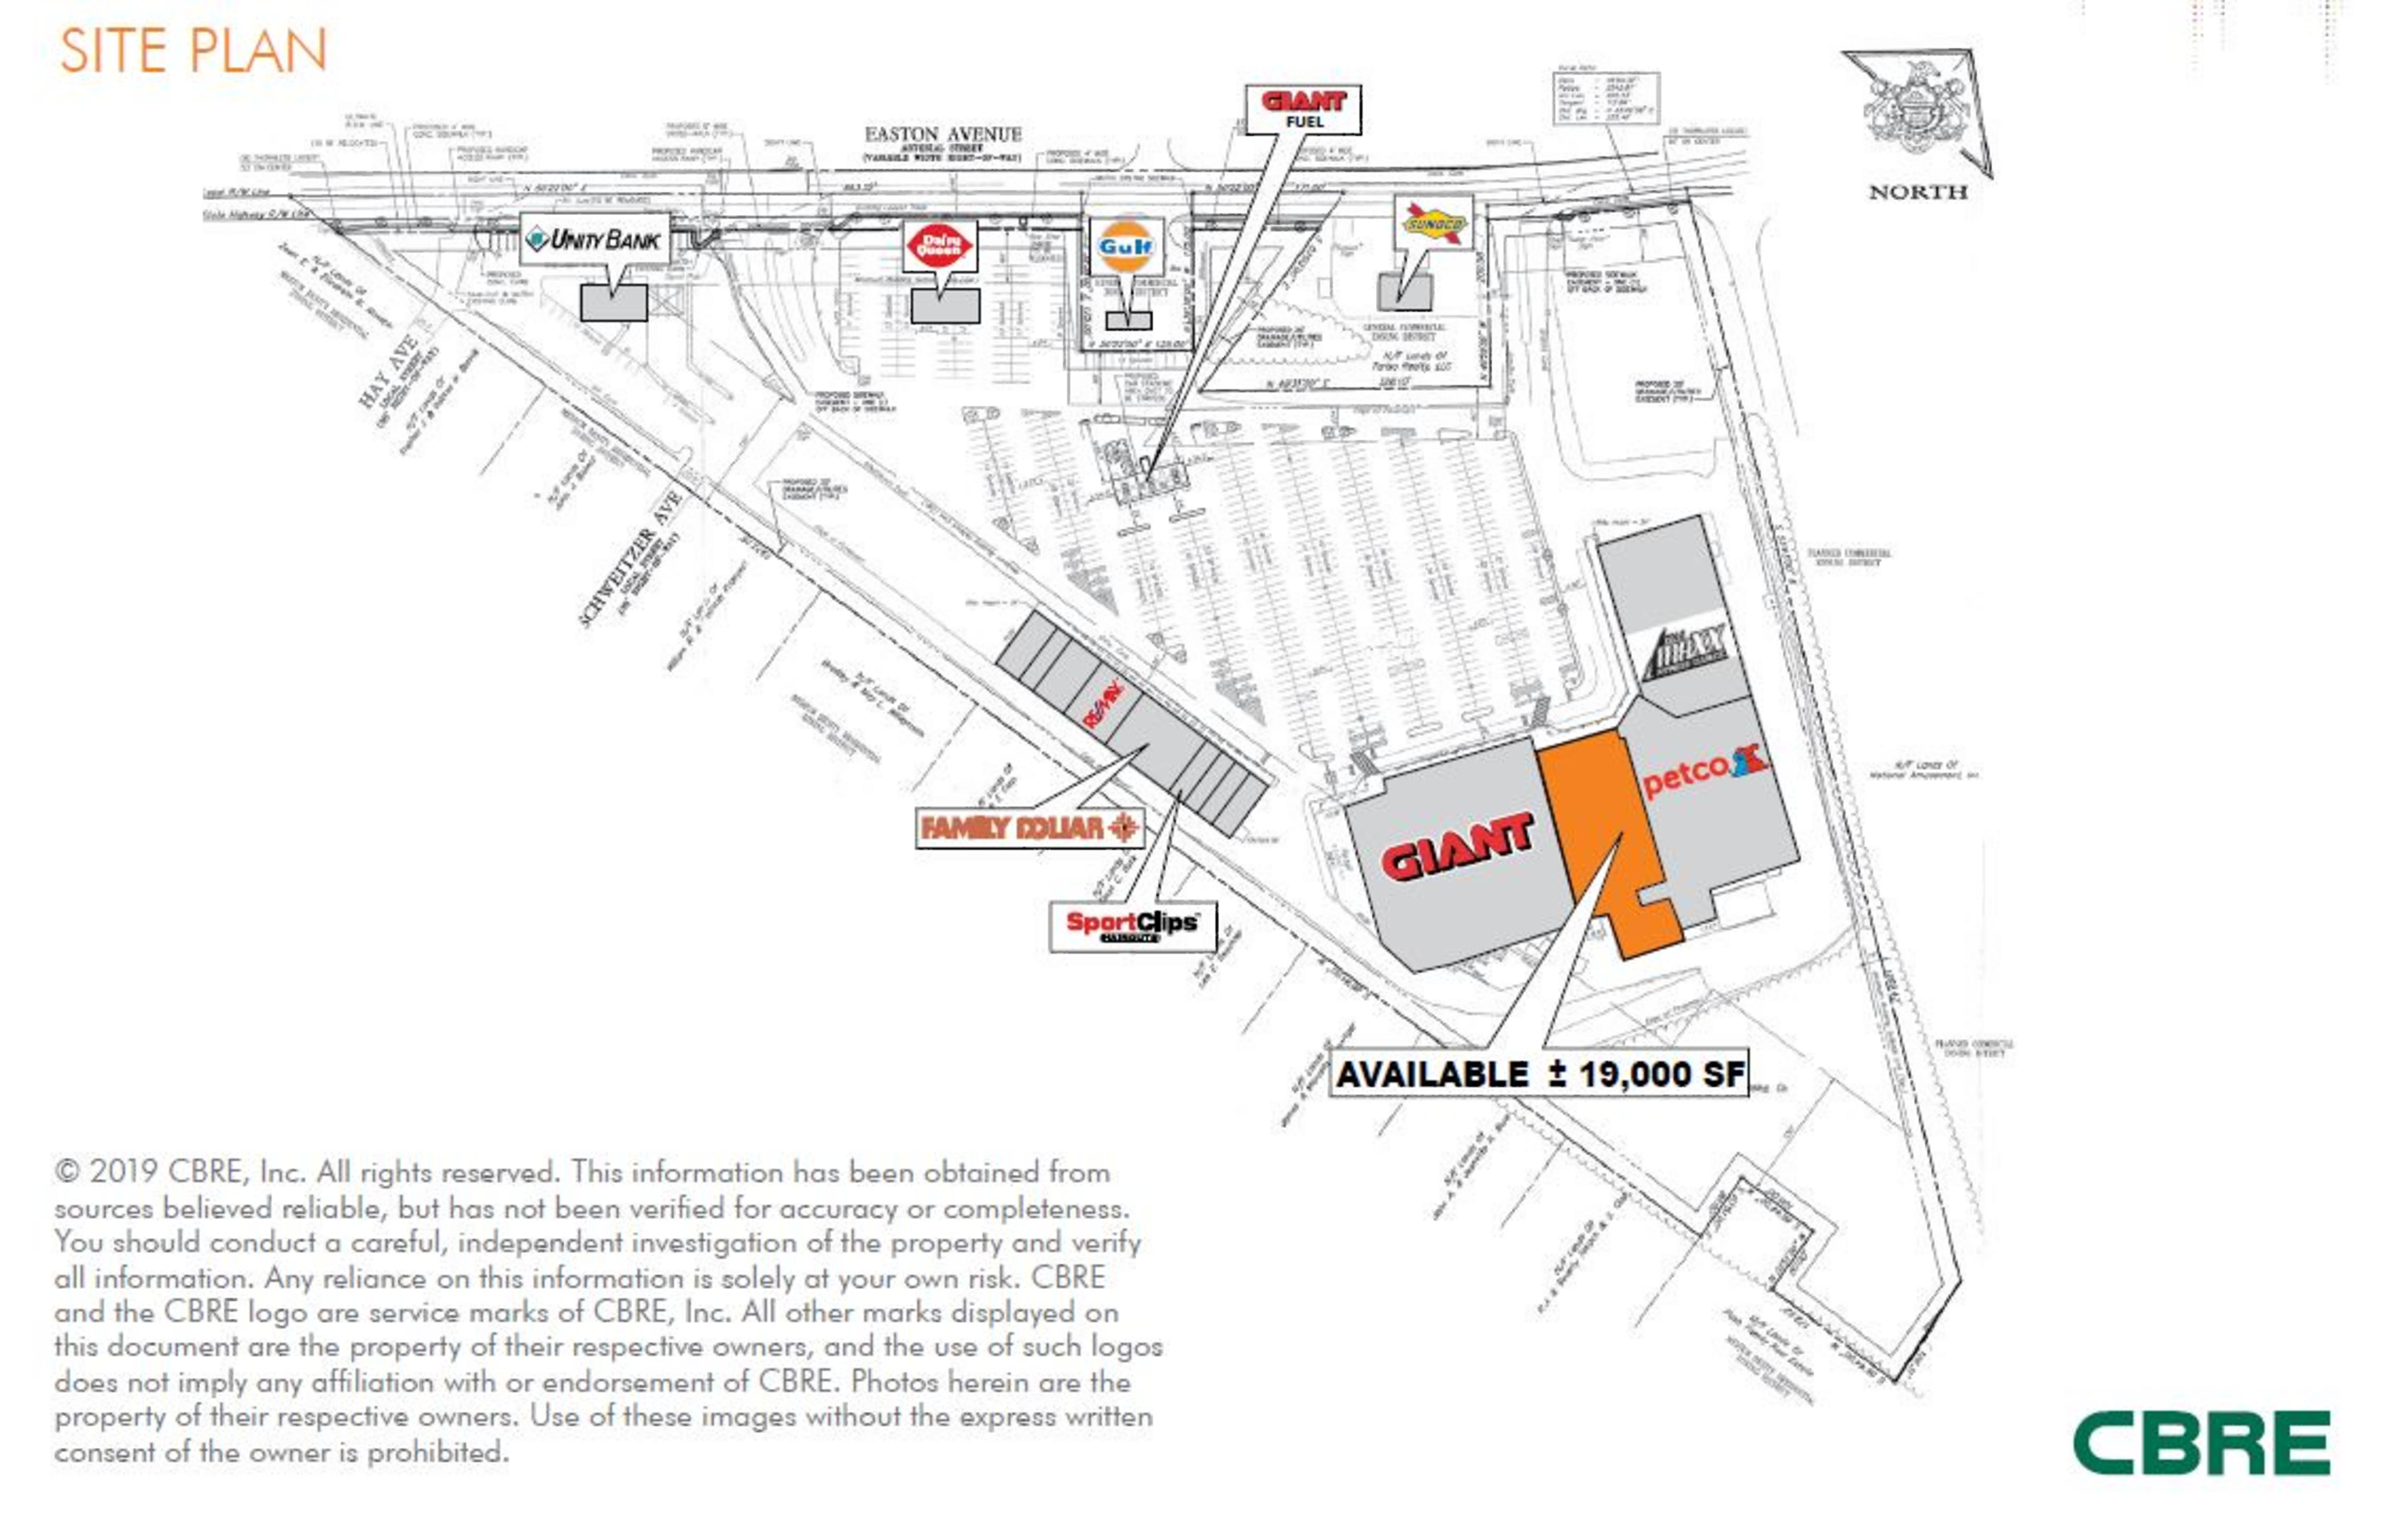 2918 Easton Avenue: site plan